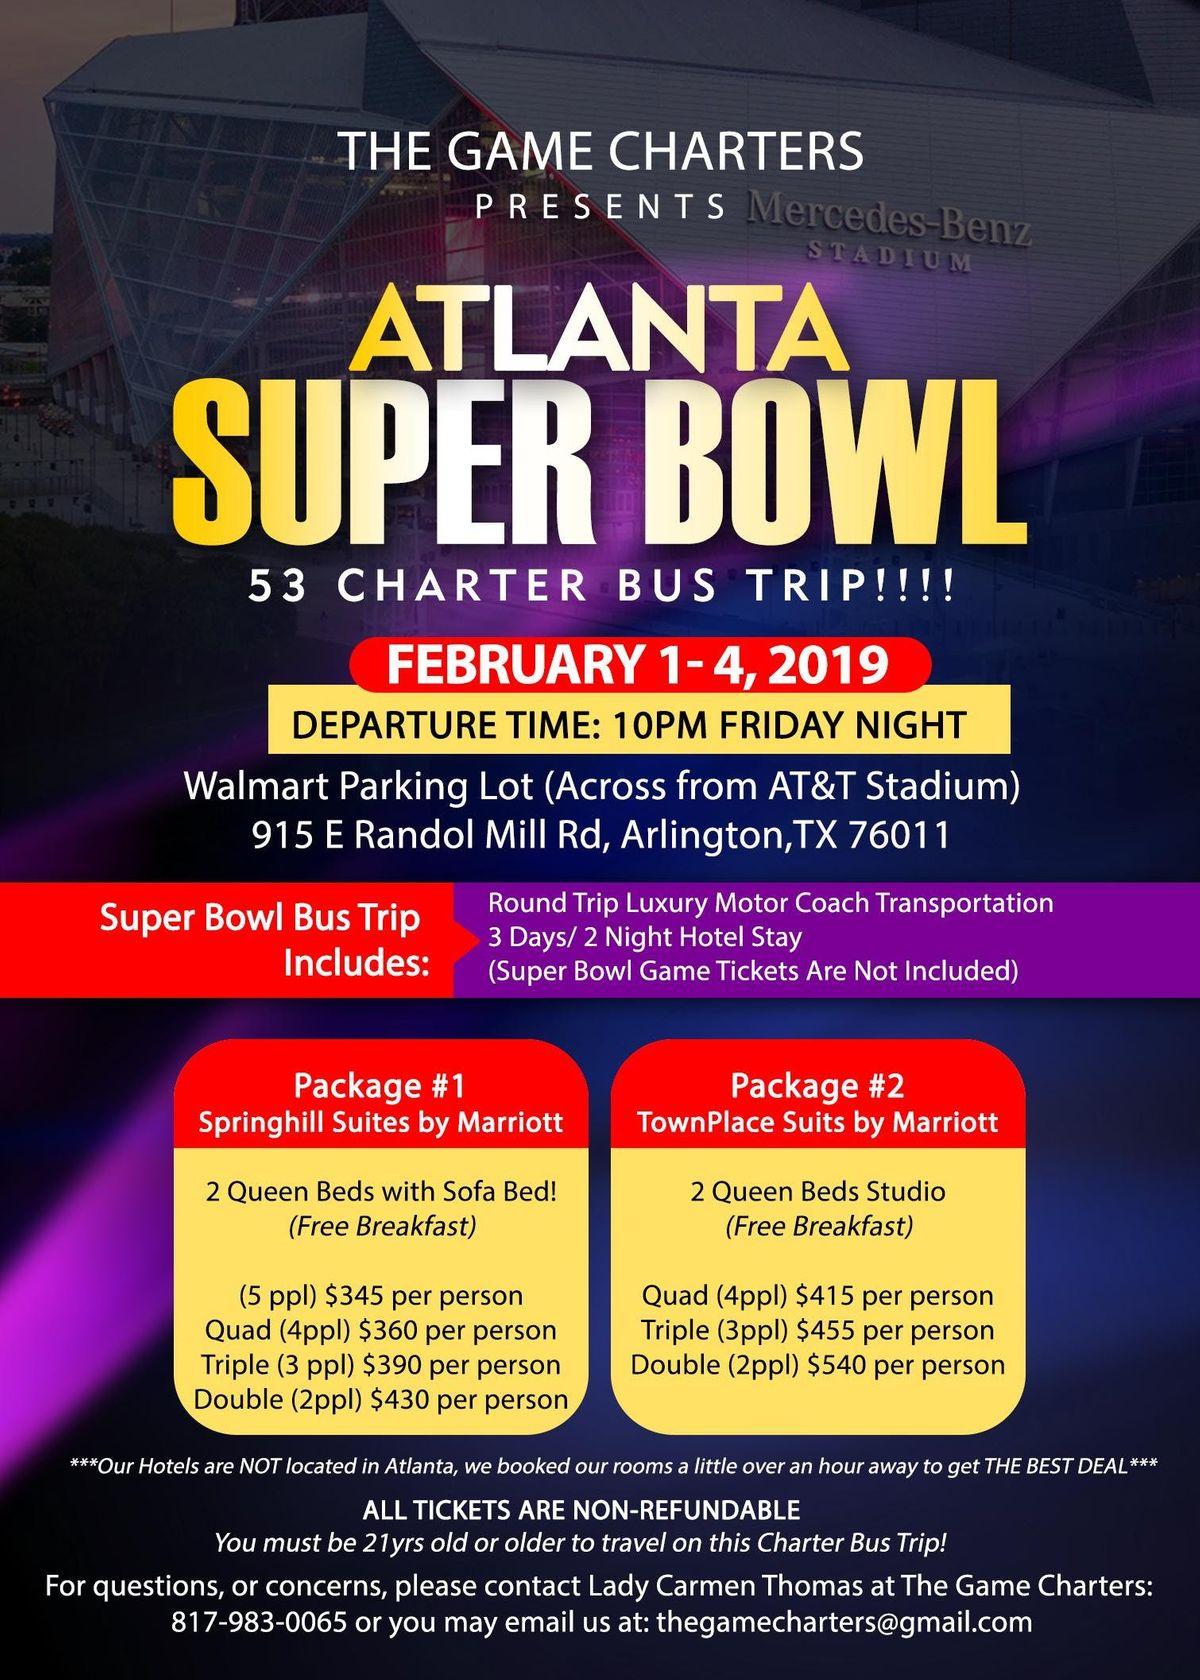 Atlanta Super Bowl 53 Charter Bus Trip (From Arlington TX)